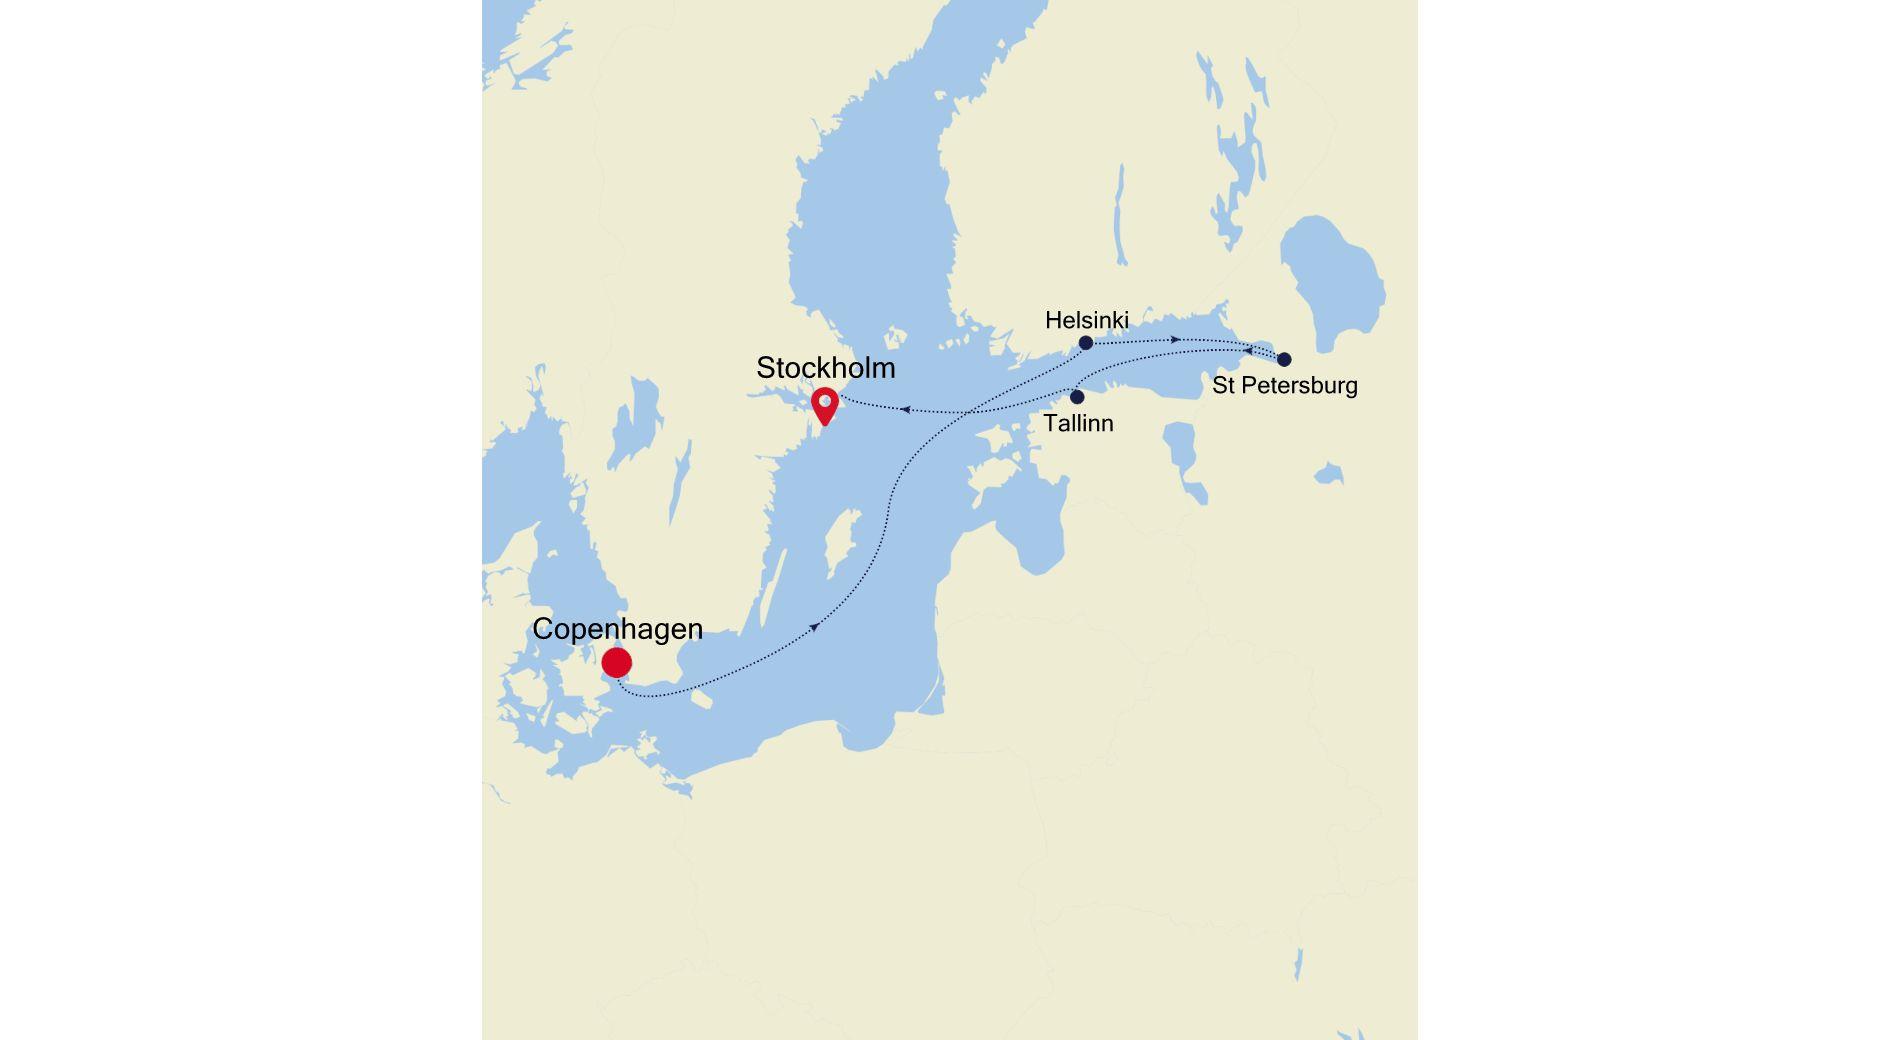 SL210622007 - Copenhagen a Stockholm